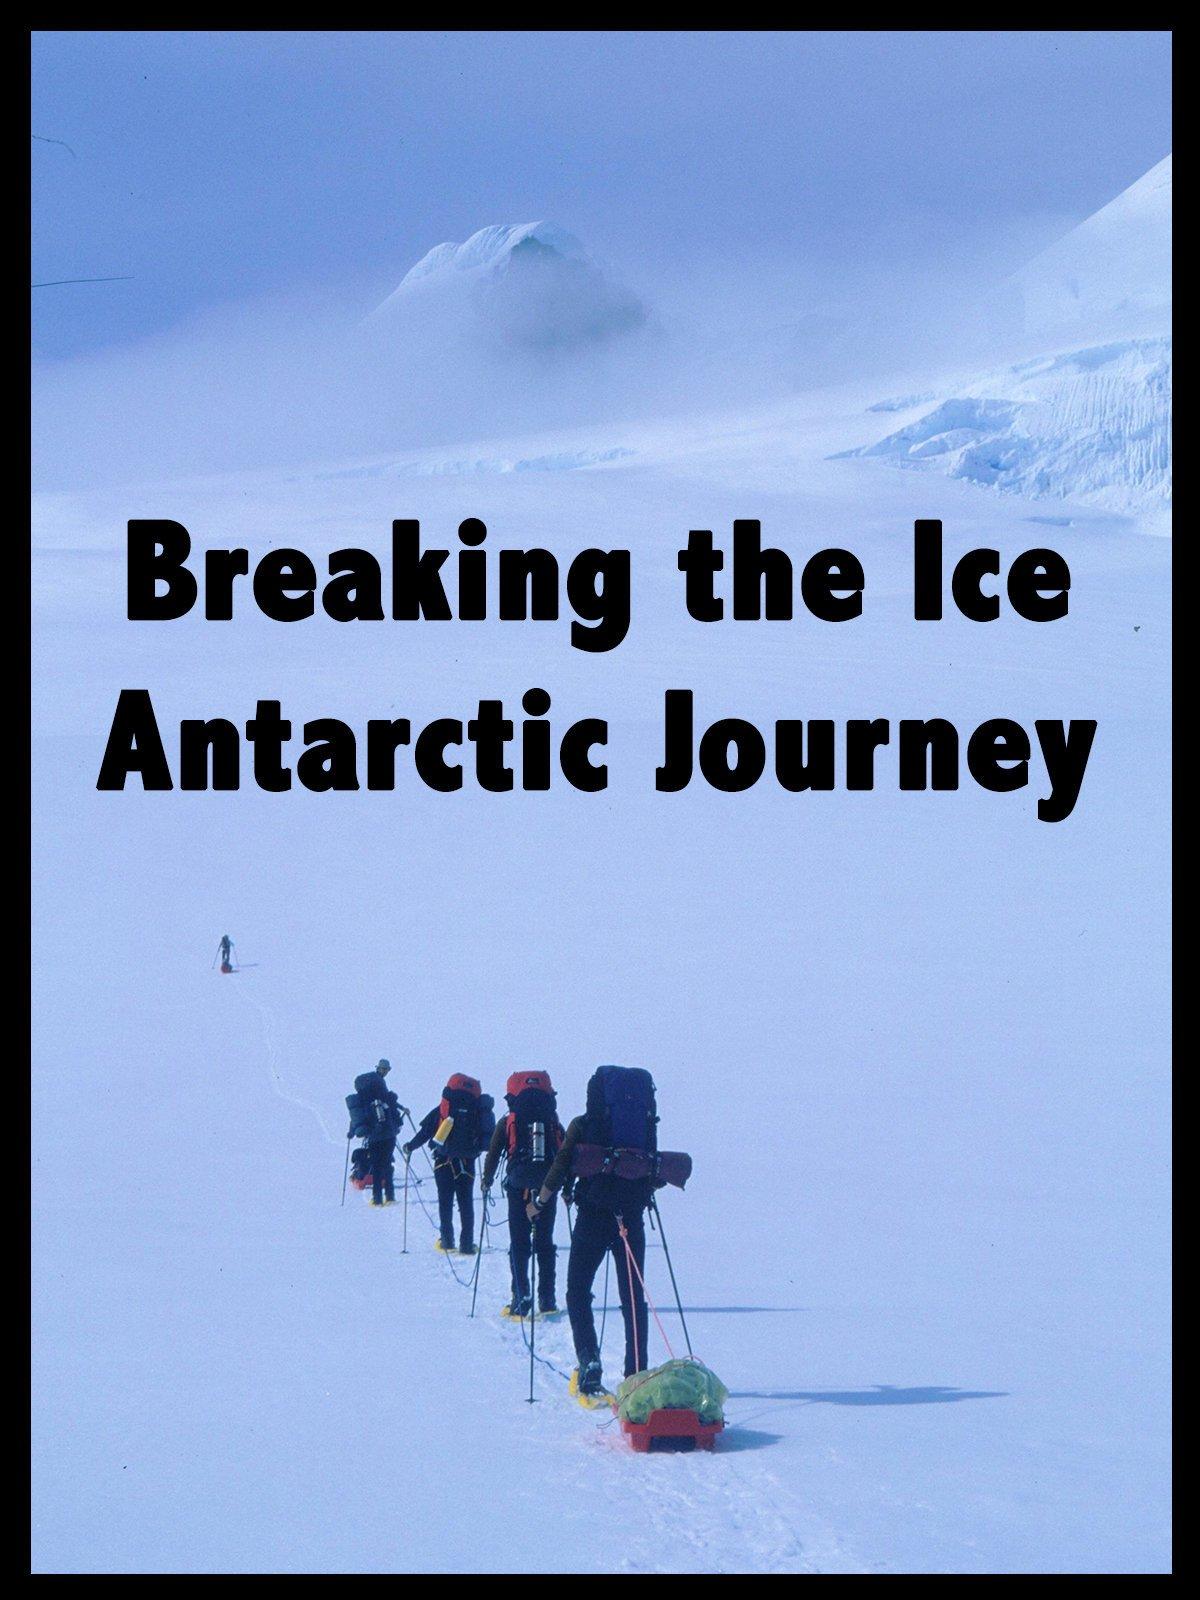 Breaking the Ice: Antarctic Journey